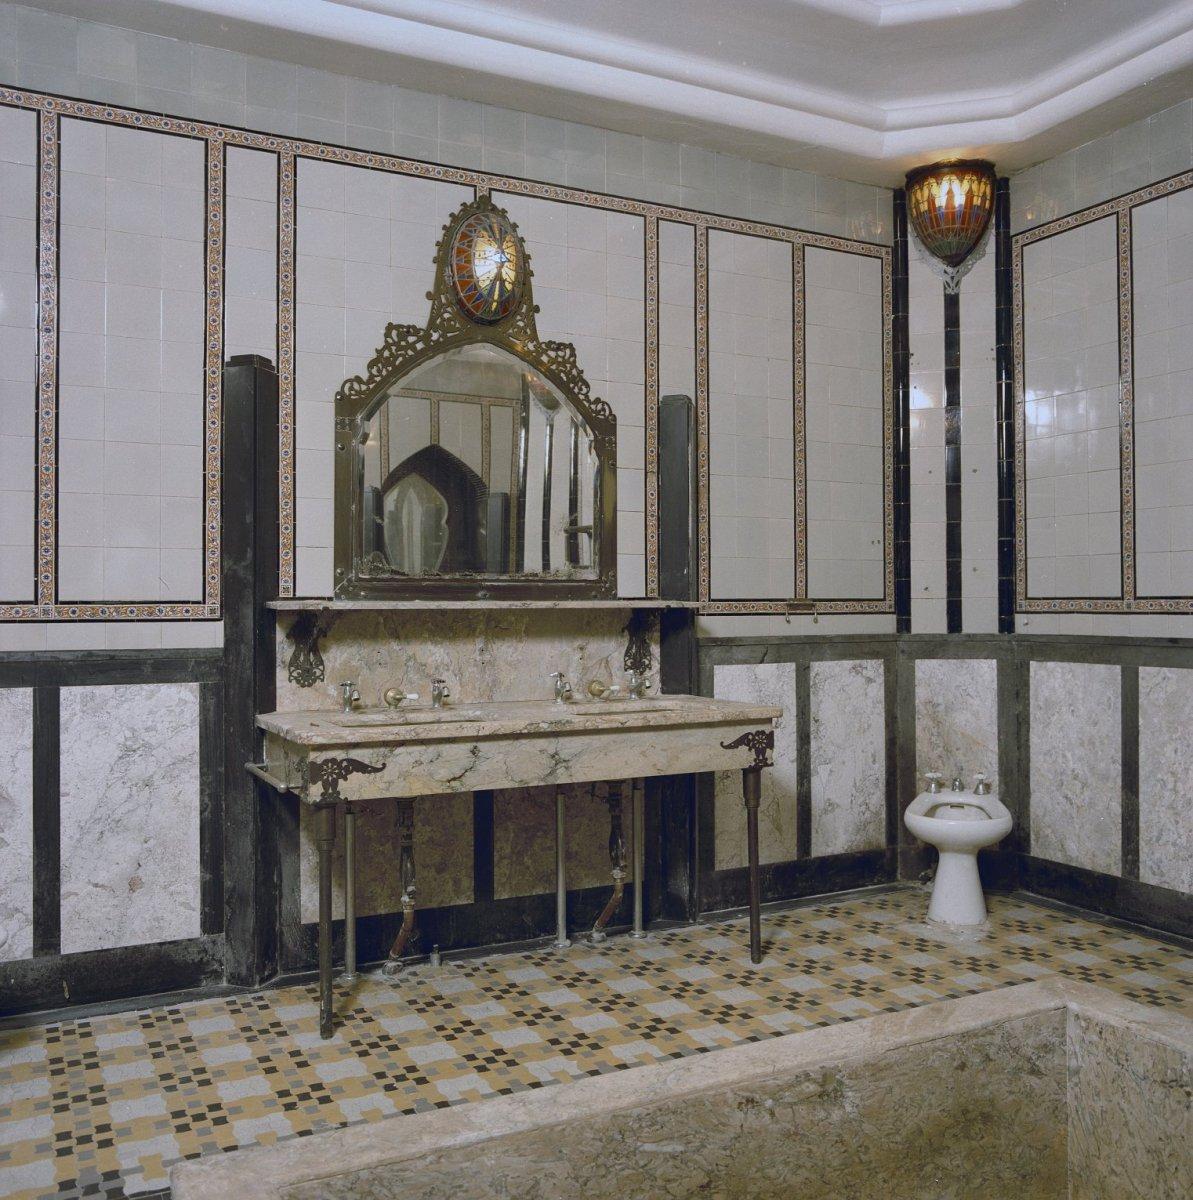 Fileinterieur badkamer art deco wastafel den dolder 20280112 rcejpg badkamer spiegel art deco - Deco badkamer meubels ...